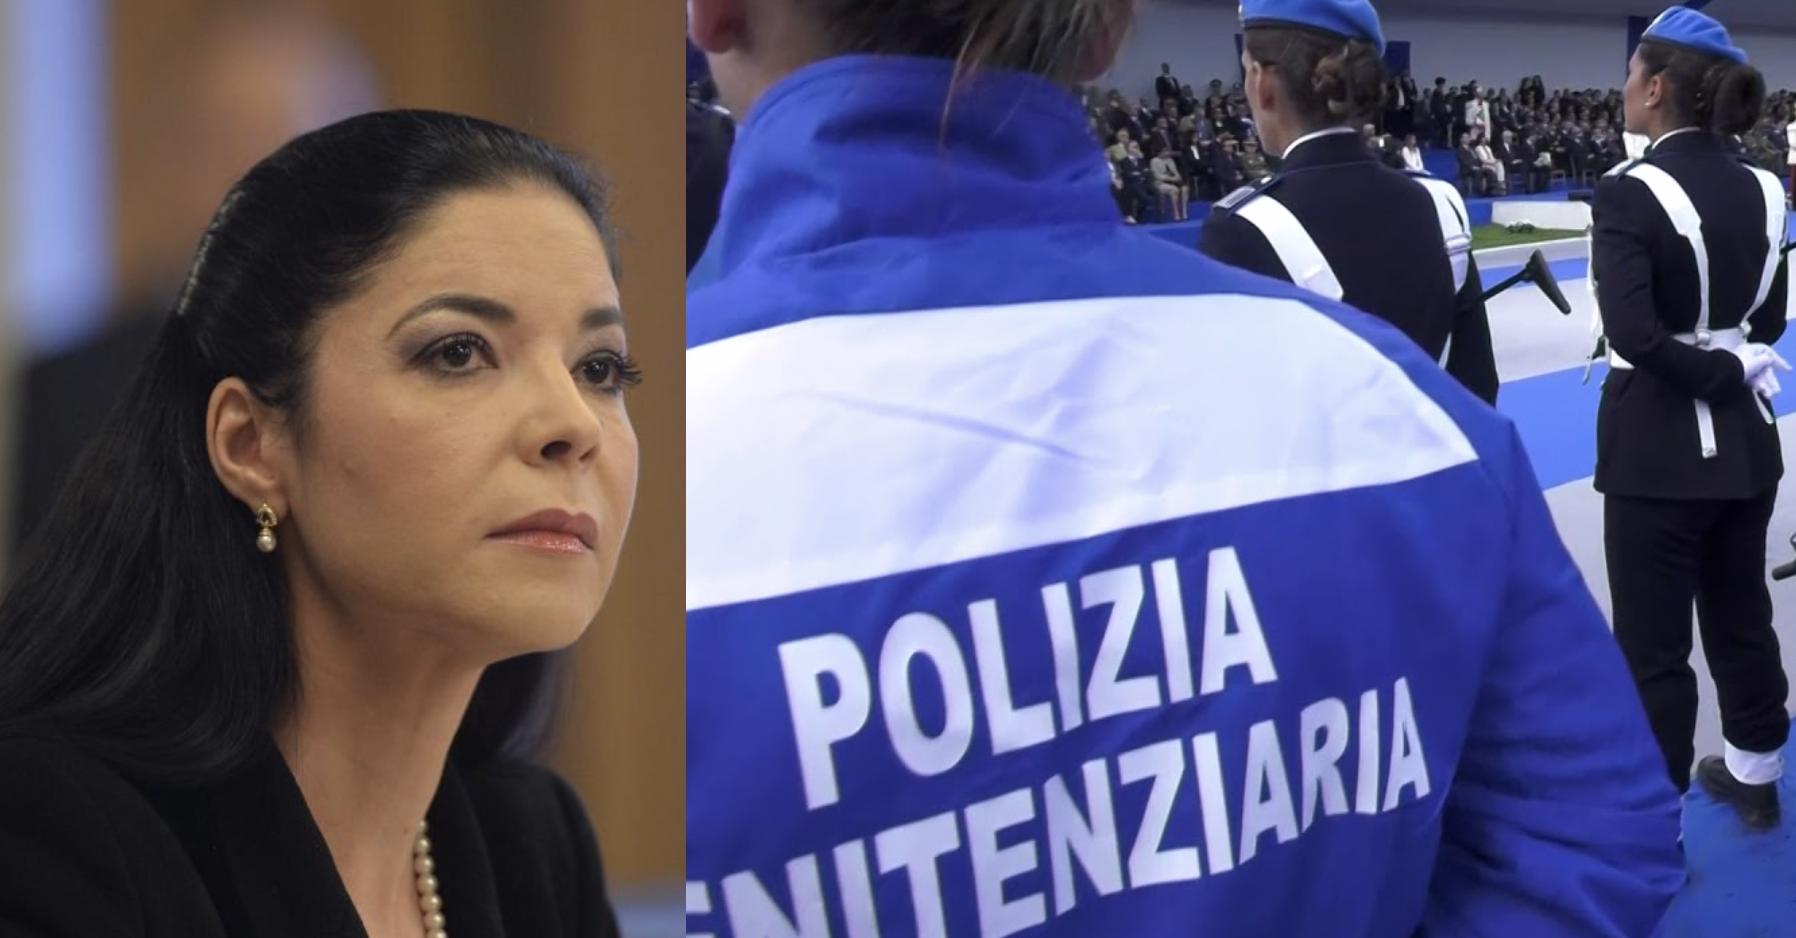 SNLP: Politia Penitenciara si Ana Birchall, plus cateva detalii – partea I